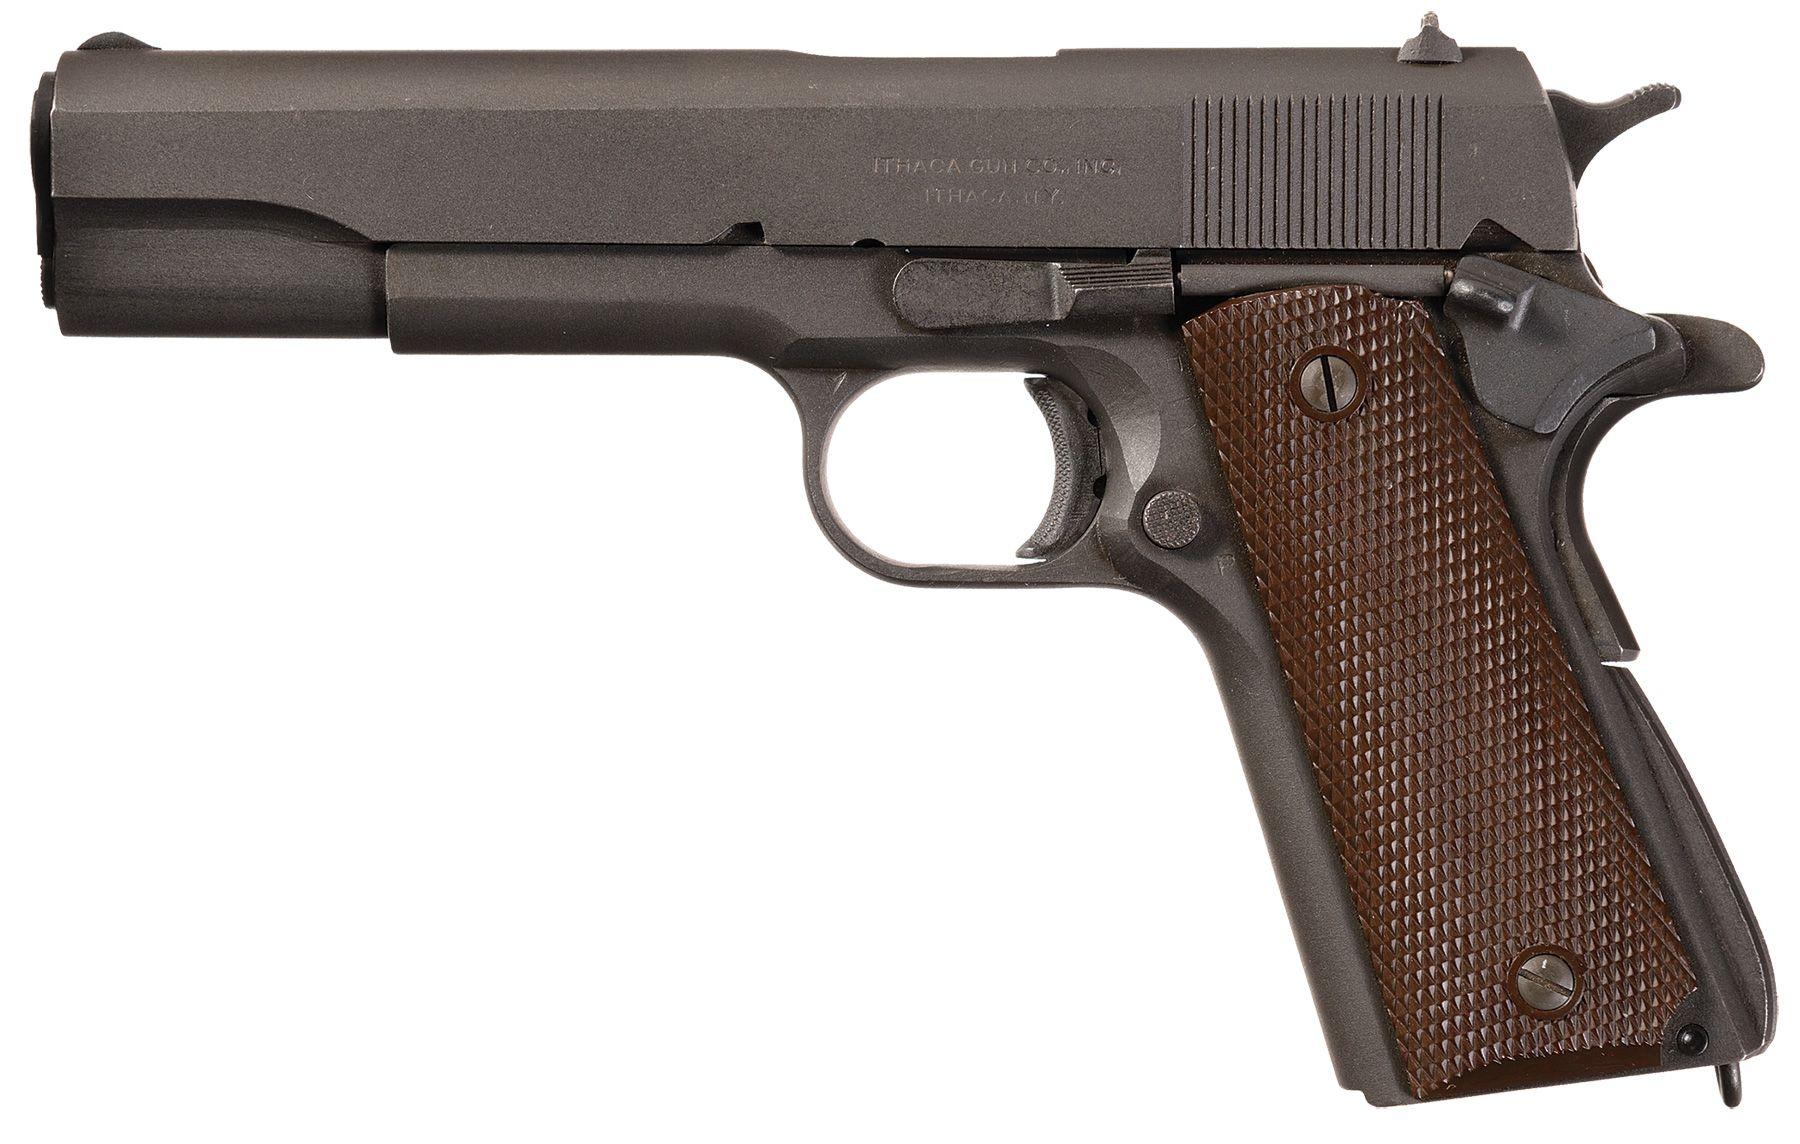 U S  Ithaca Model 1911A1 Pistol, 1945 Production